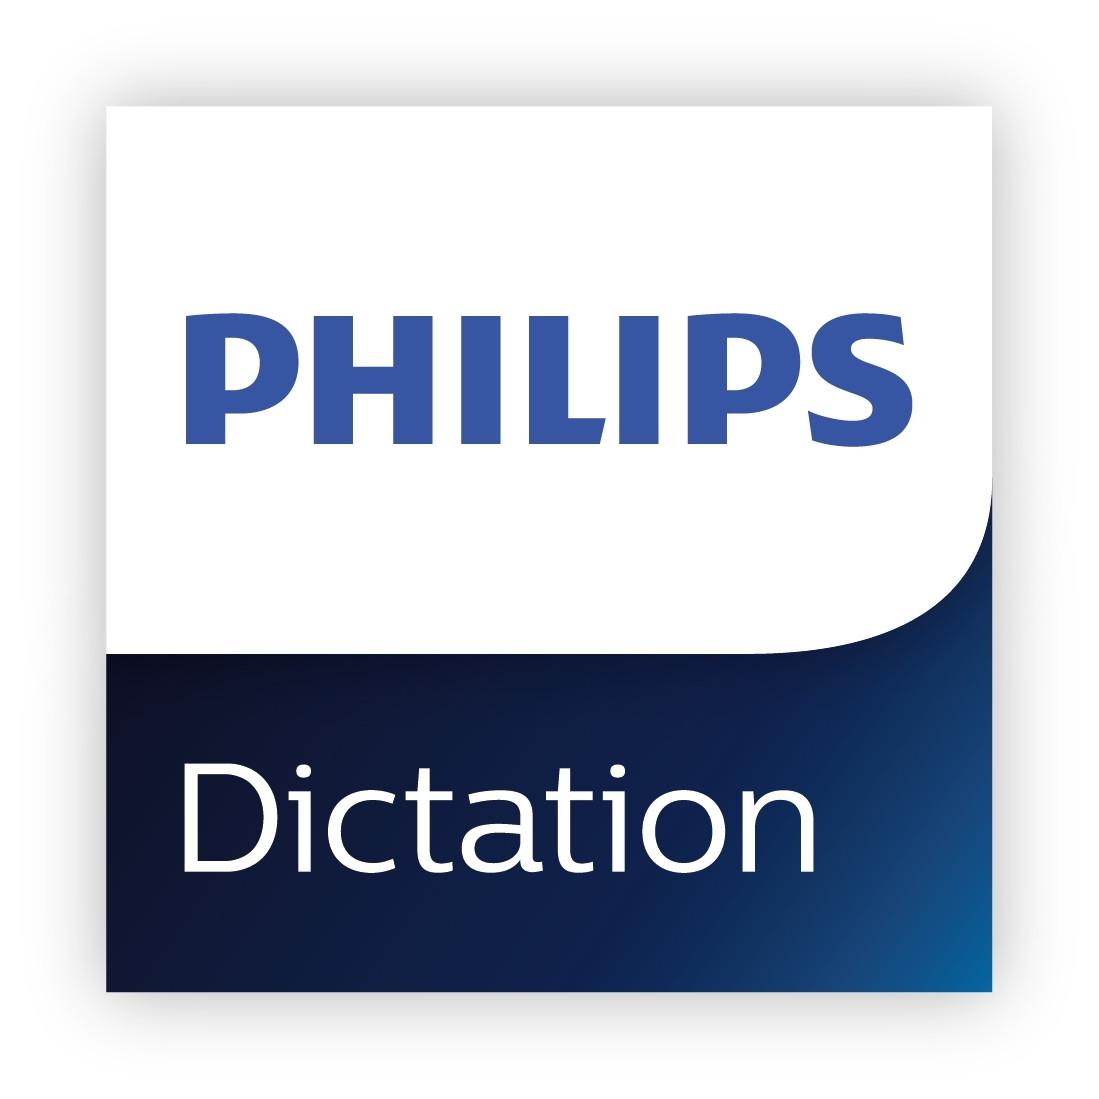 Philips Dictation